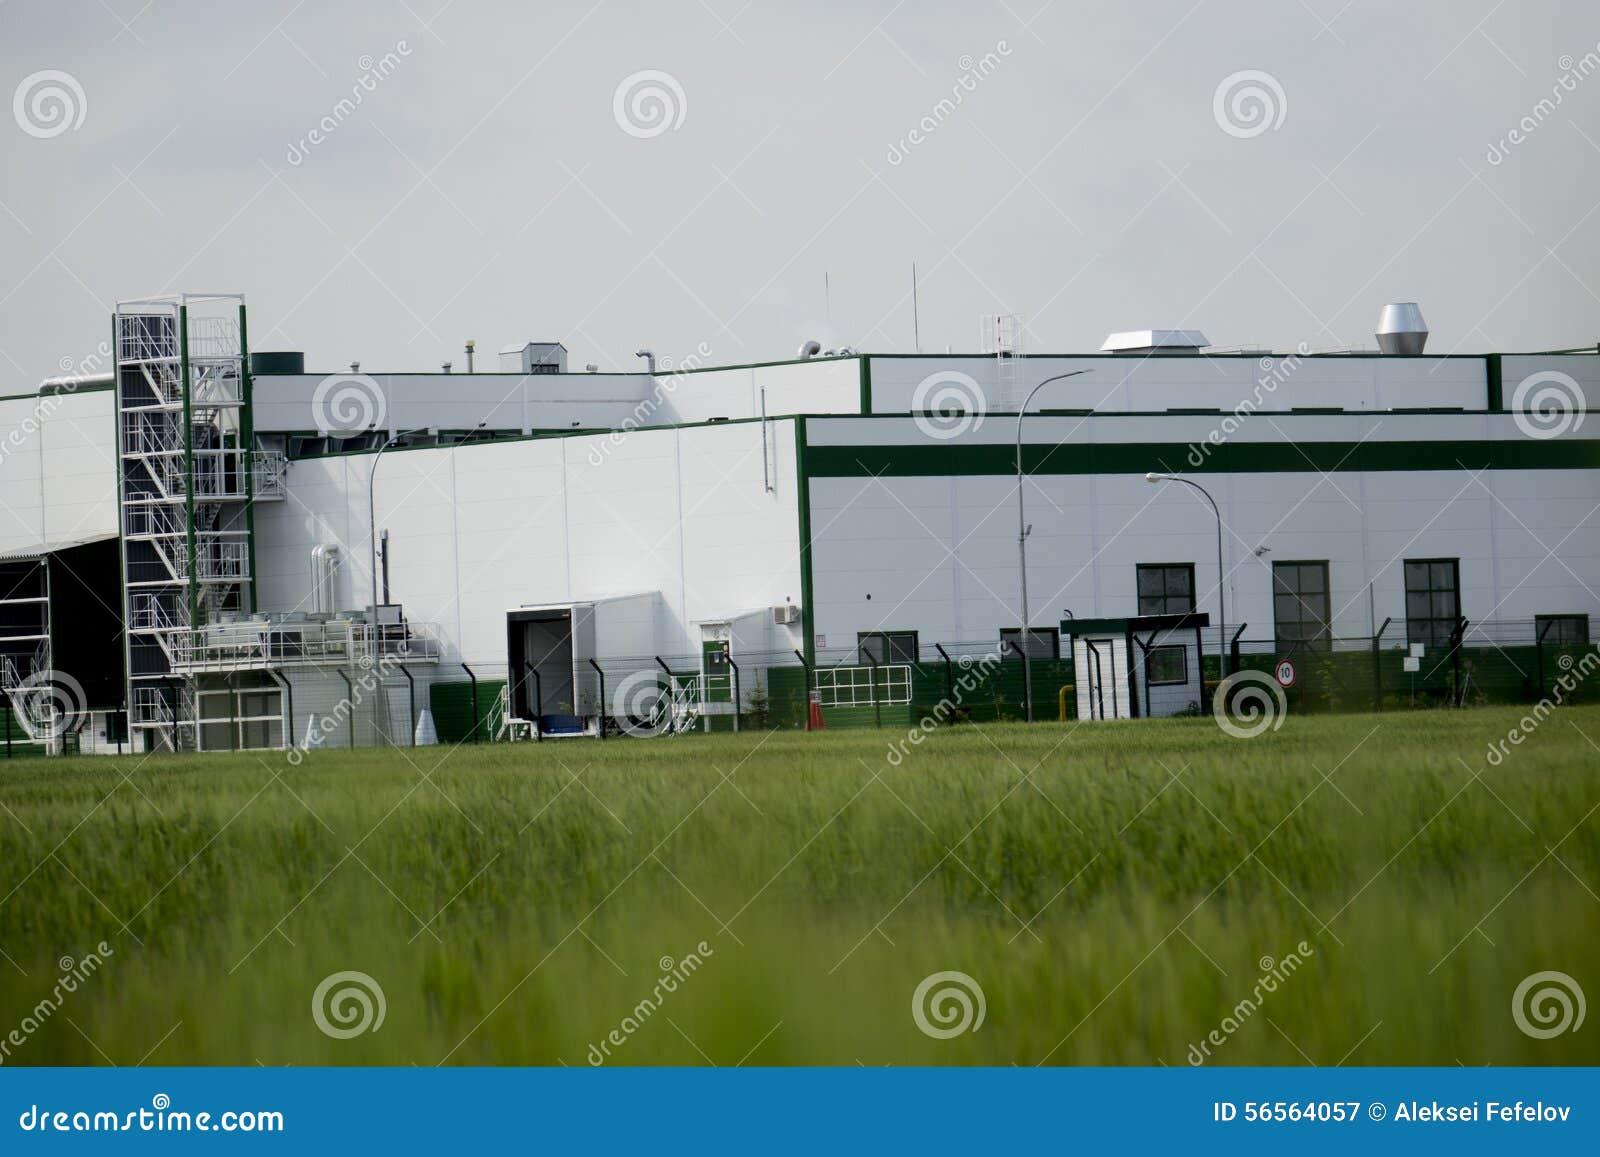 Download τα χρώματα κτηρίων αντιπαραβάλλουν υψηλό βιομηχανικό Στοκ Εικόνα - εικόνα από βιομηχανικός, άσπρος: 56564057